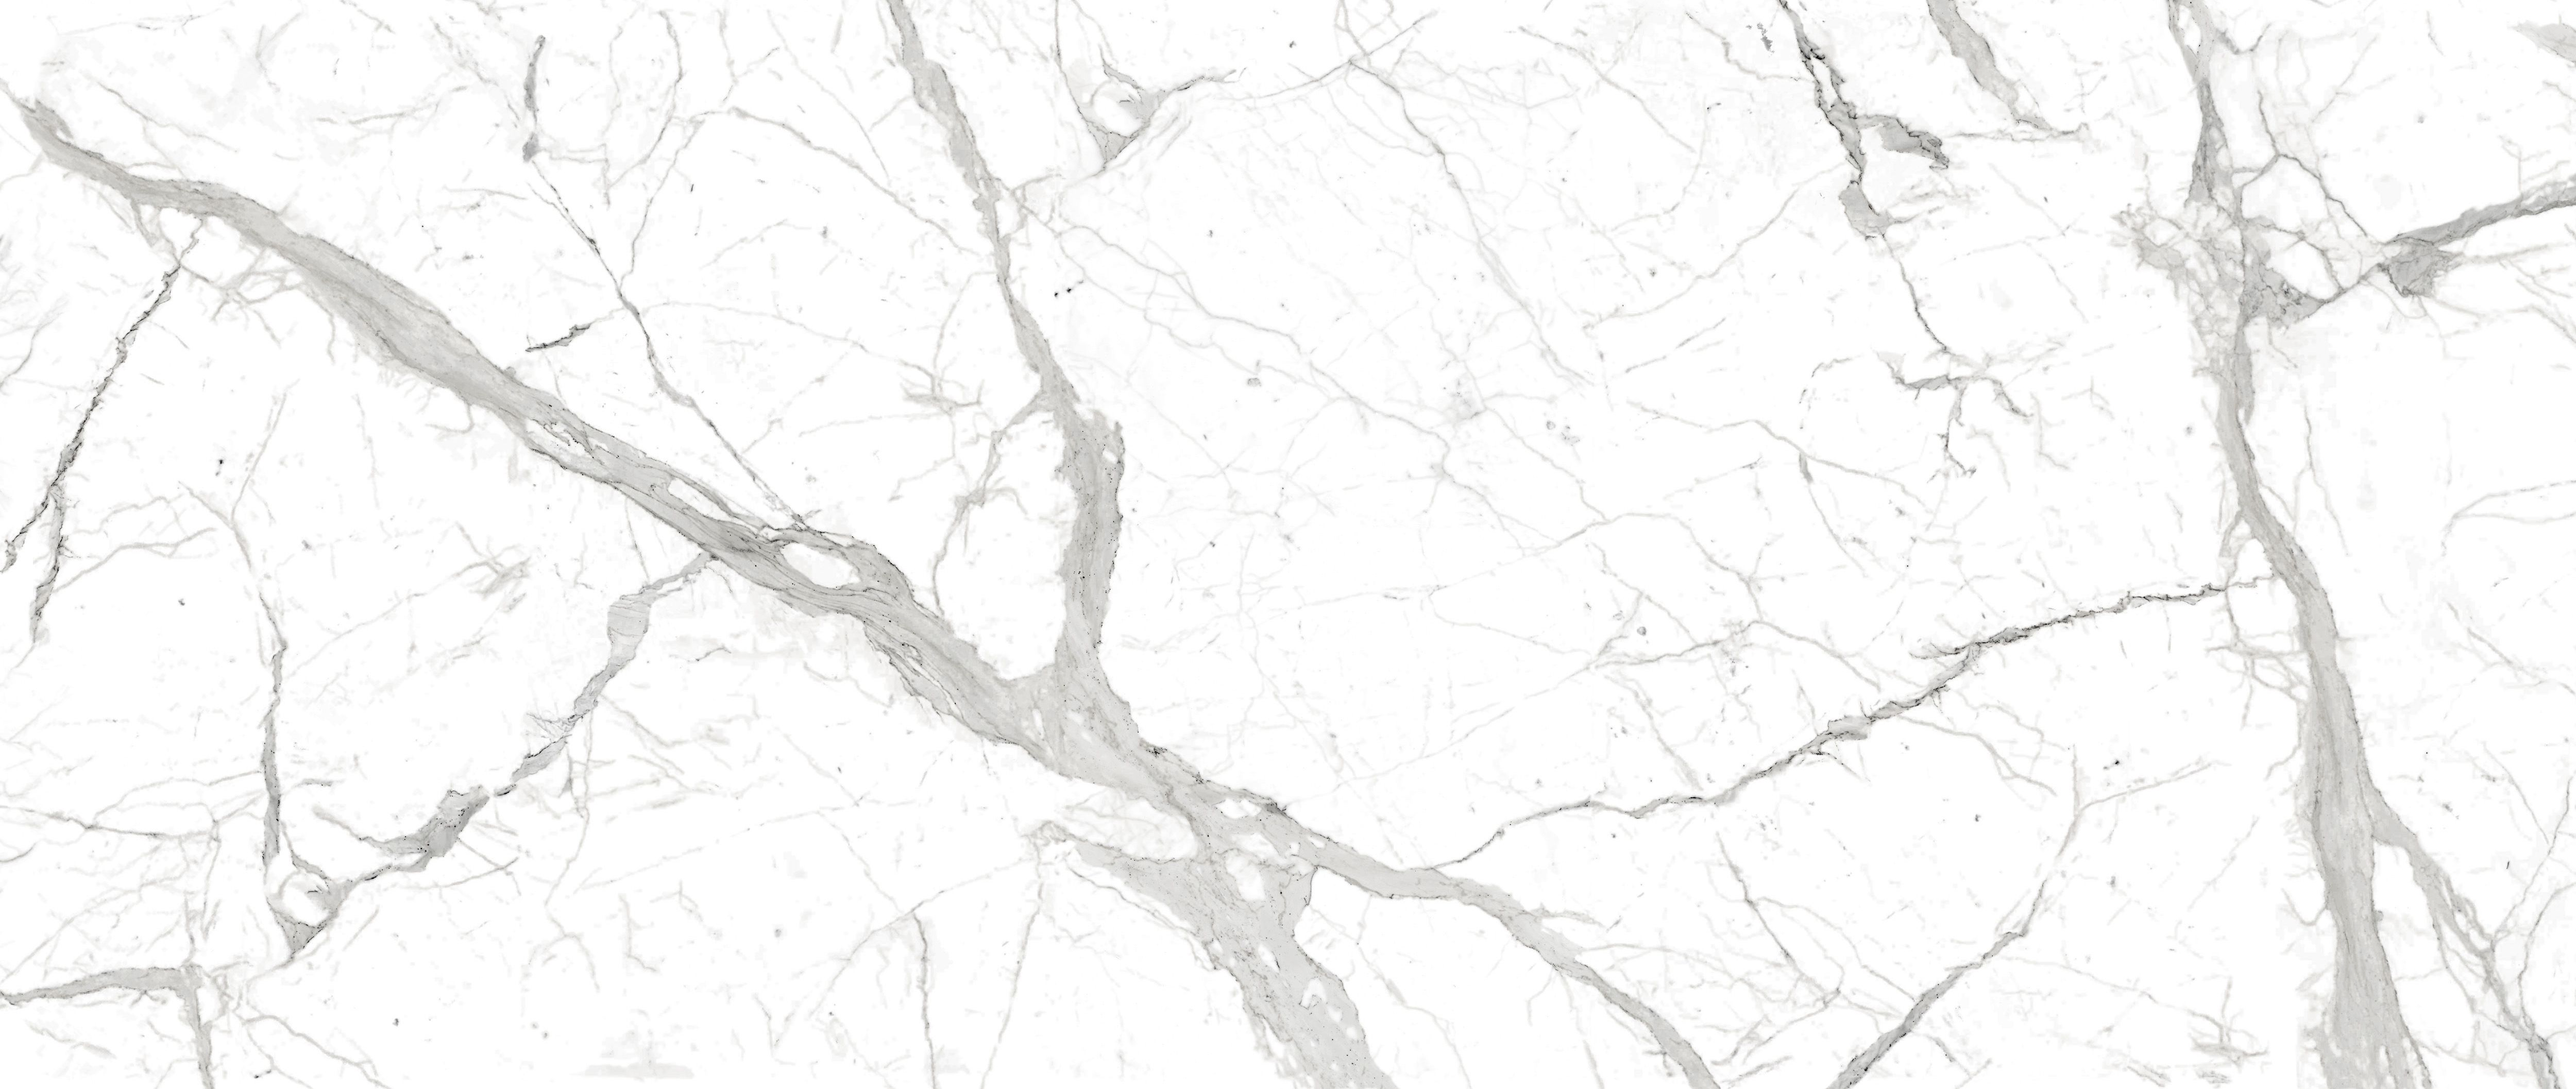 Statuario Granite Transformations Marble Collection 1 Jpg Jpeg Image 5000 215 2114 Pixels